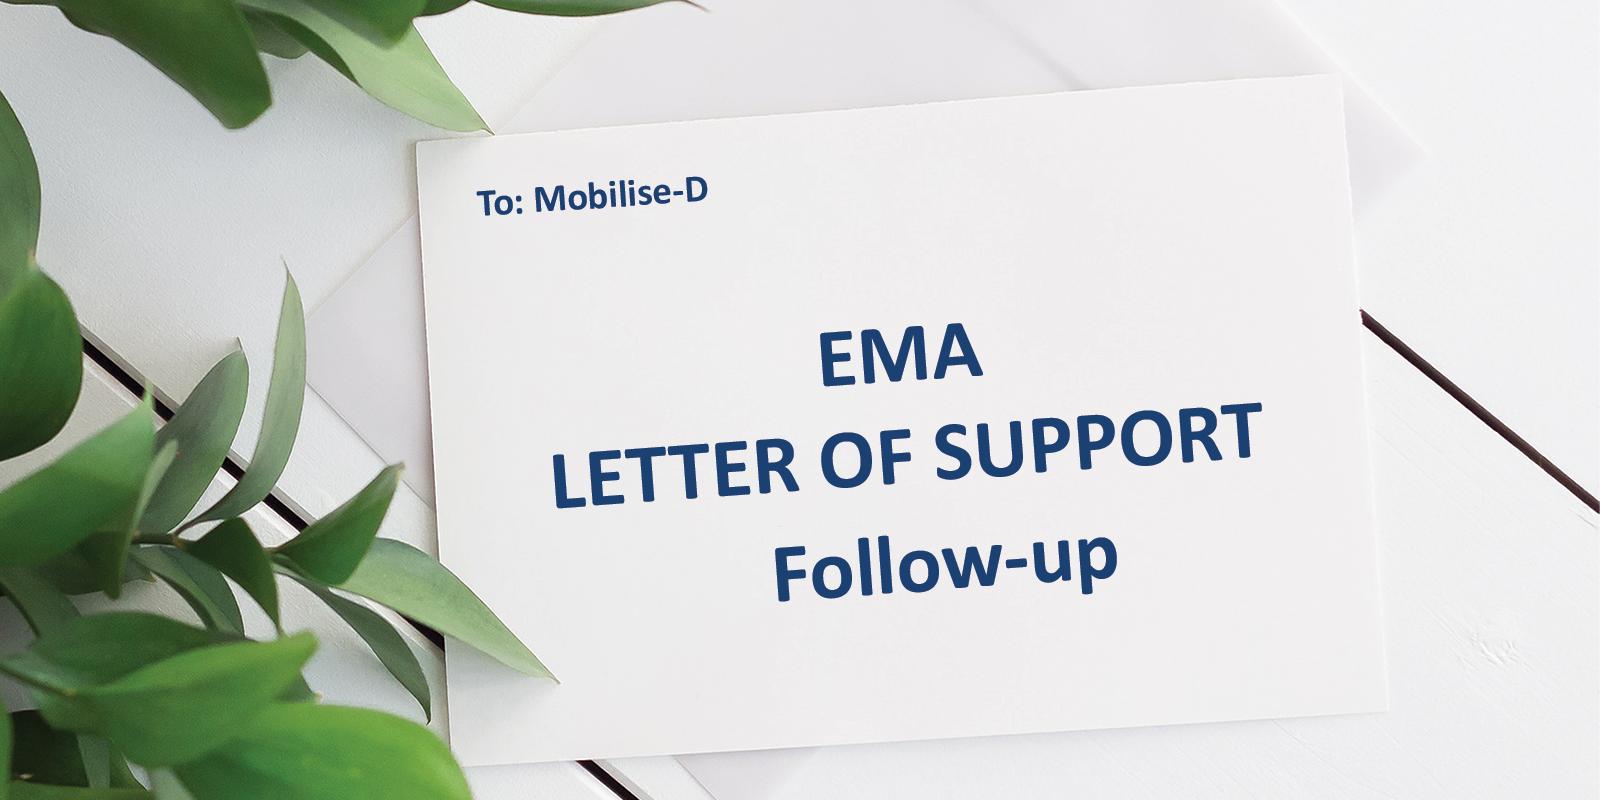 Mobilise-D EMA_LetterOfSupport-1600x800